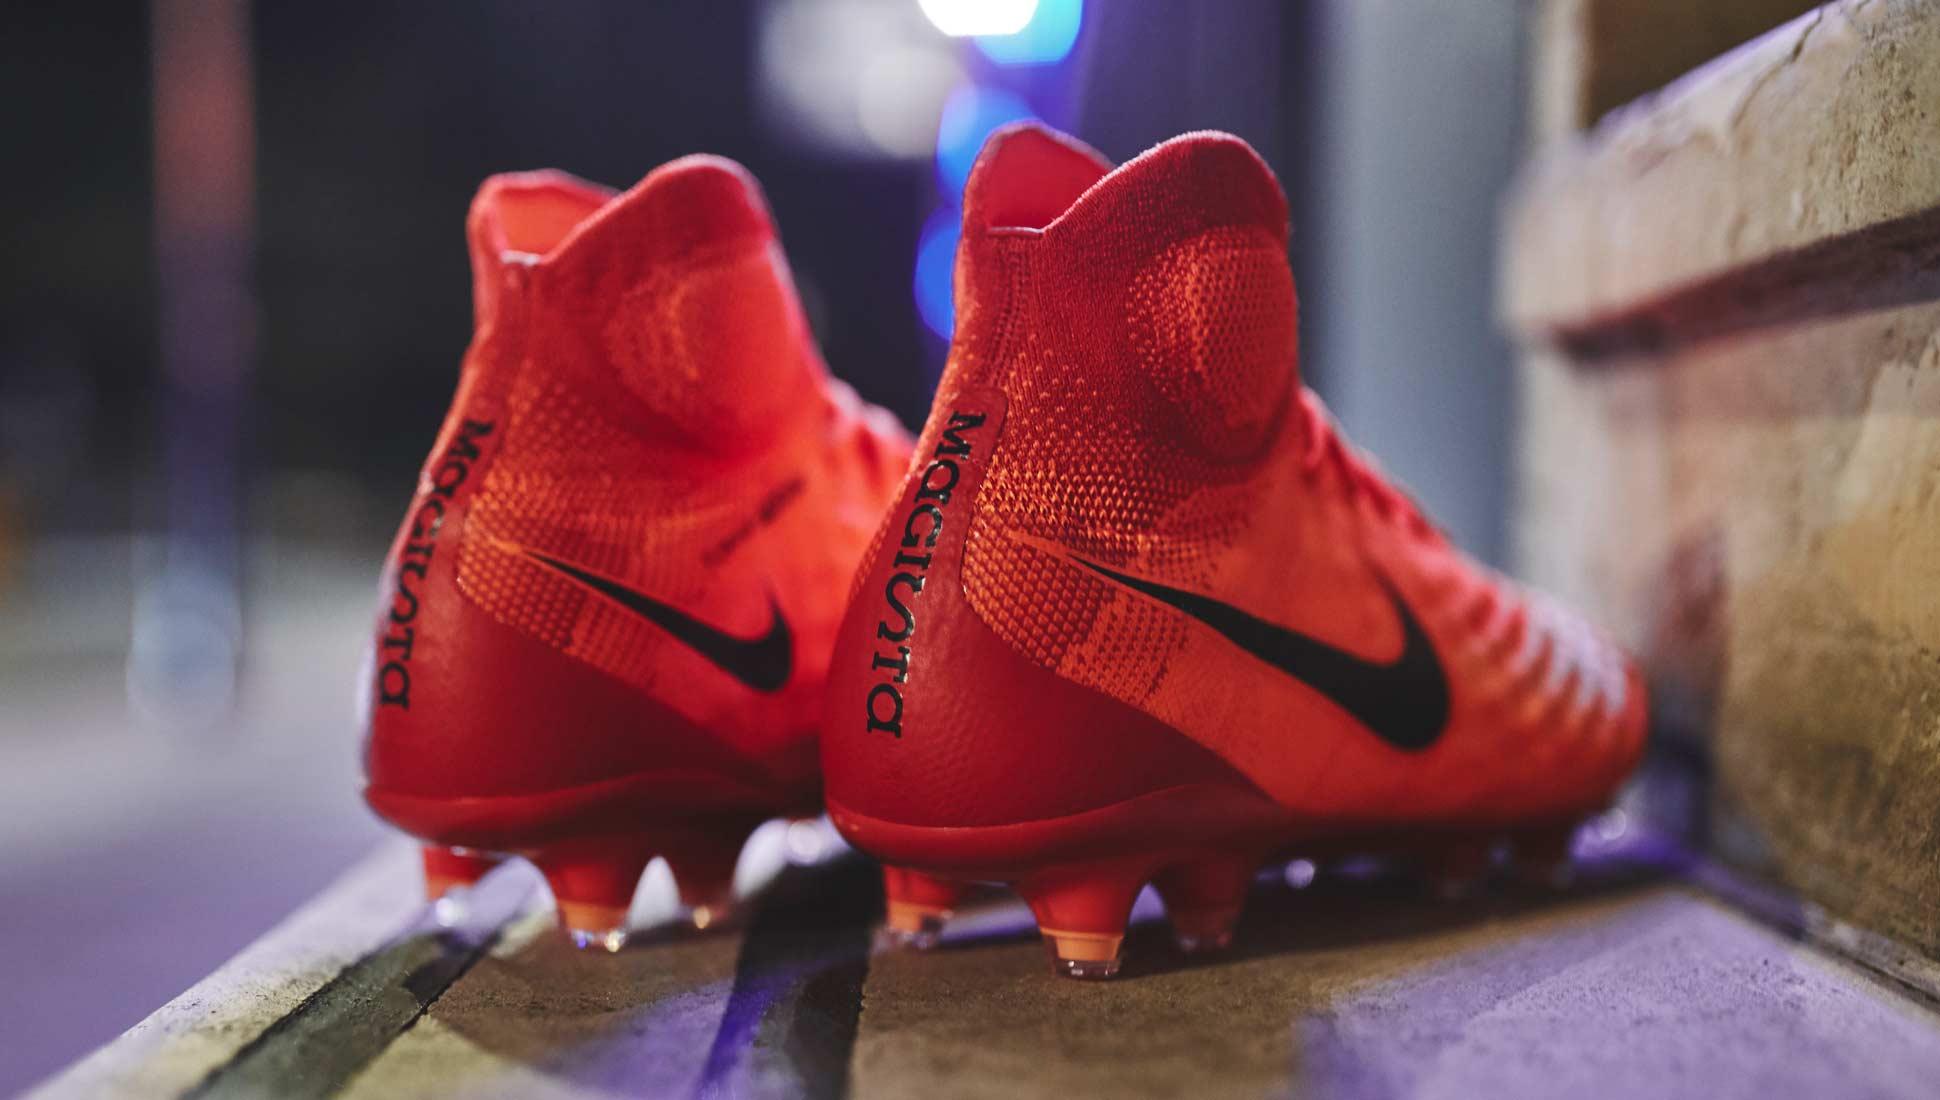 Nike 370 844855 Sport De Chaussures Homme SjUMpVLqzG